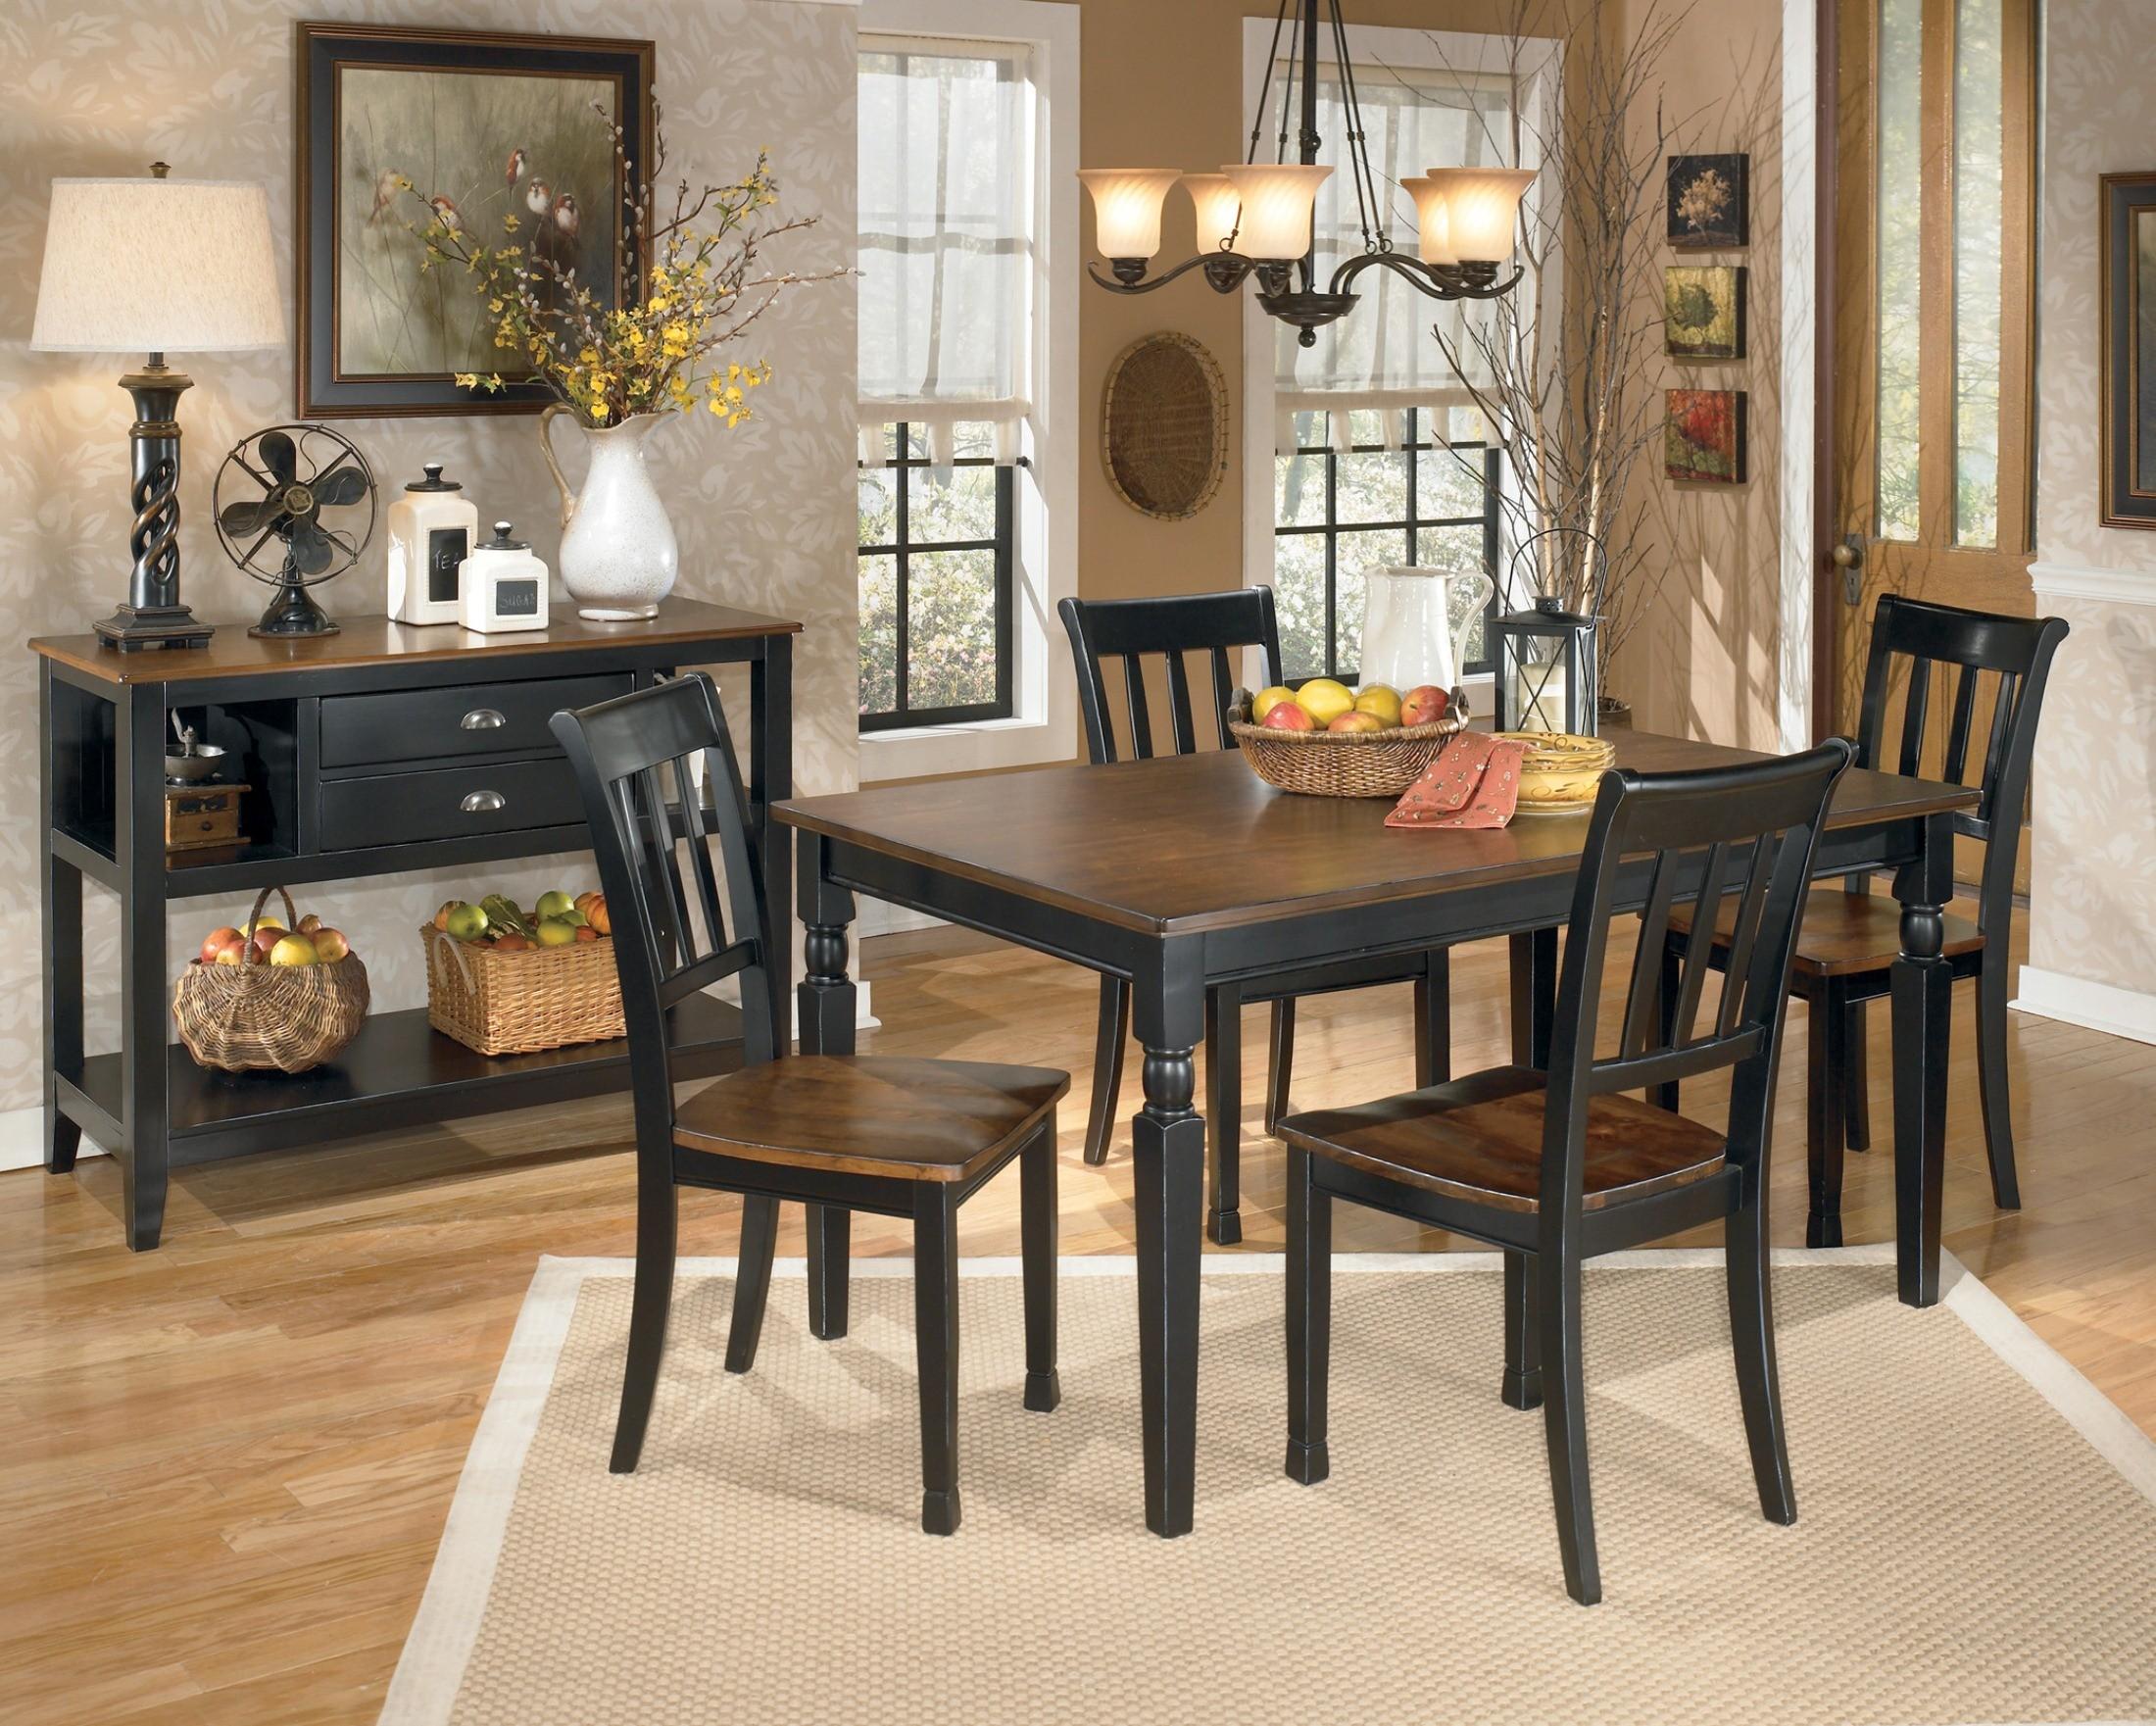 Owingsville Rectangular Dining Room Set from Ashley (D580)   Coleman Furniture